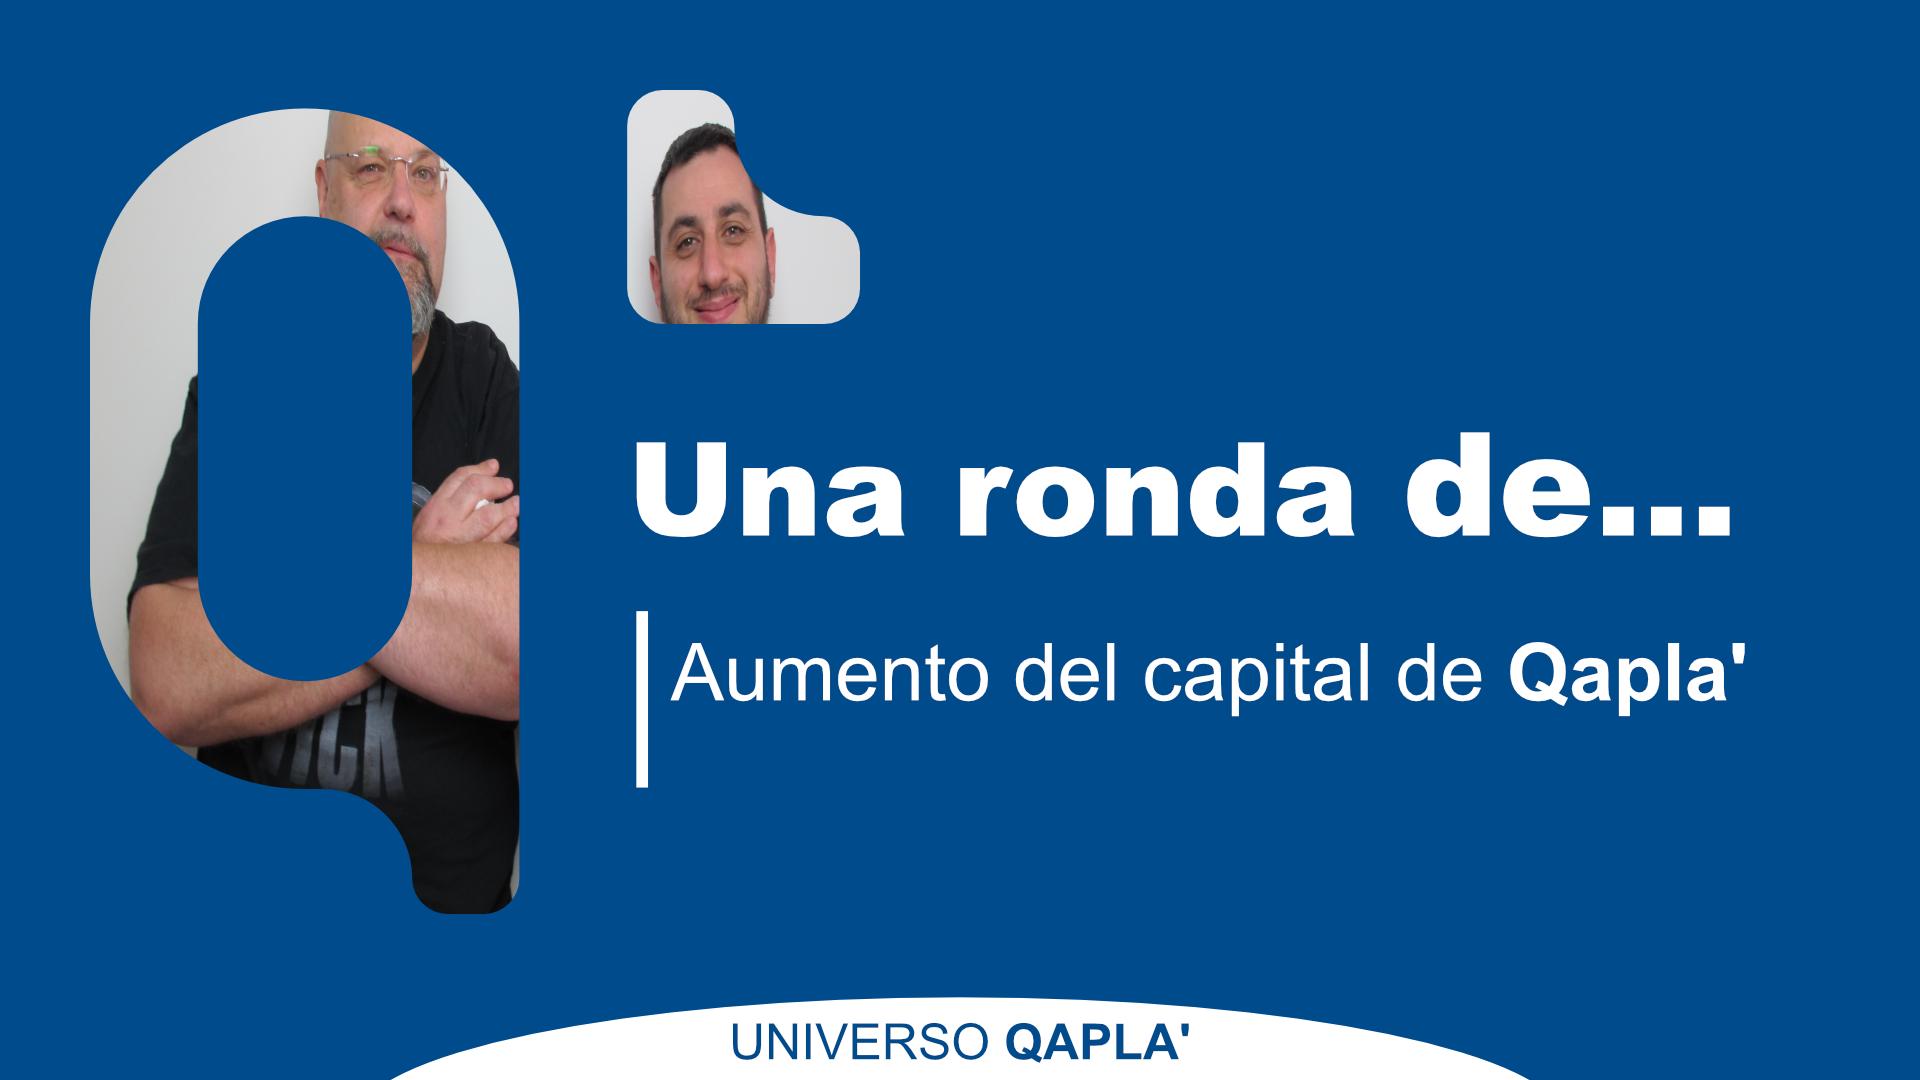 Aumento Capital Qapla'